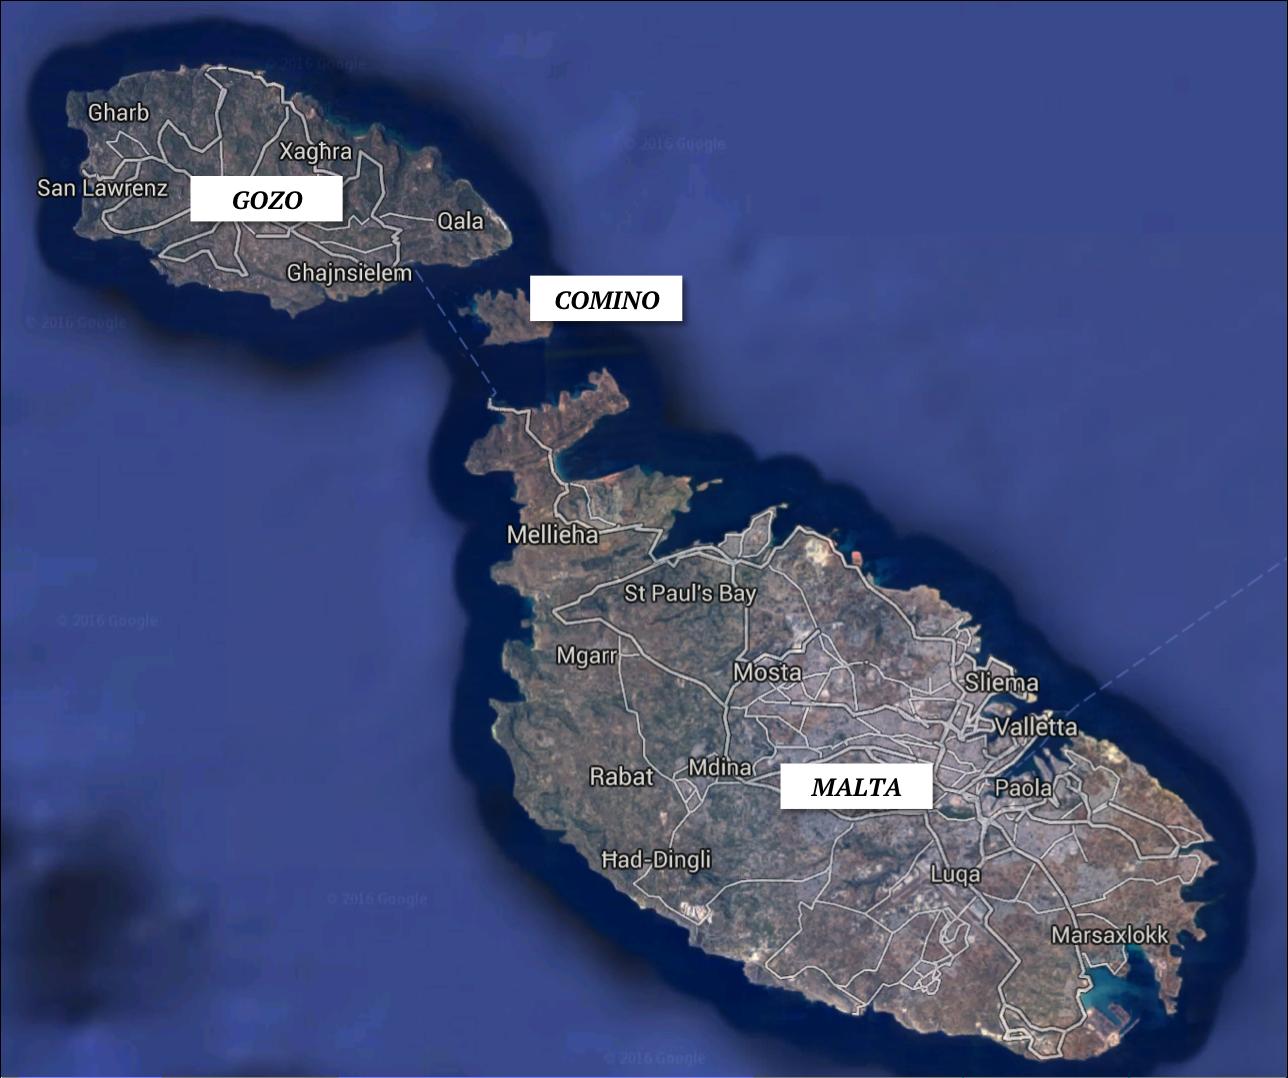 Ilhas Maltesas: Malta, Comino e Gozo | Mapa: Google Earth